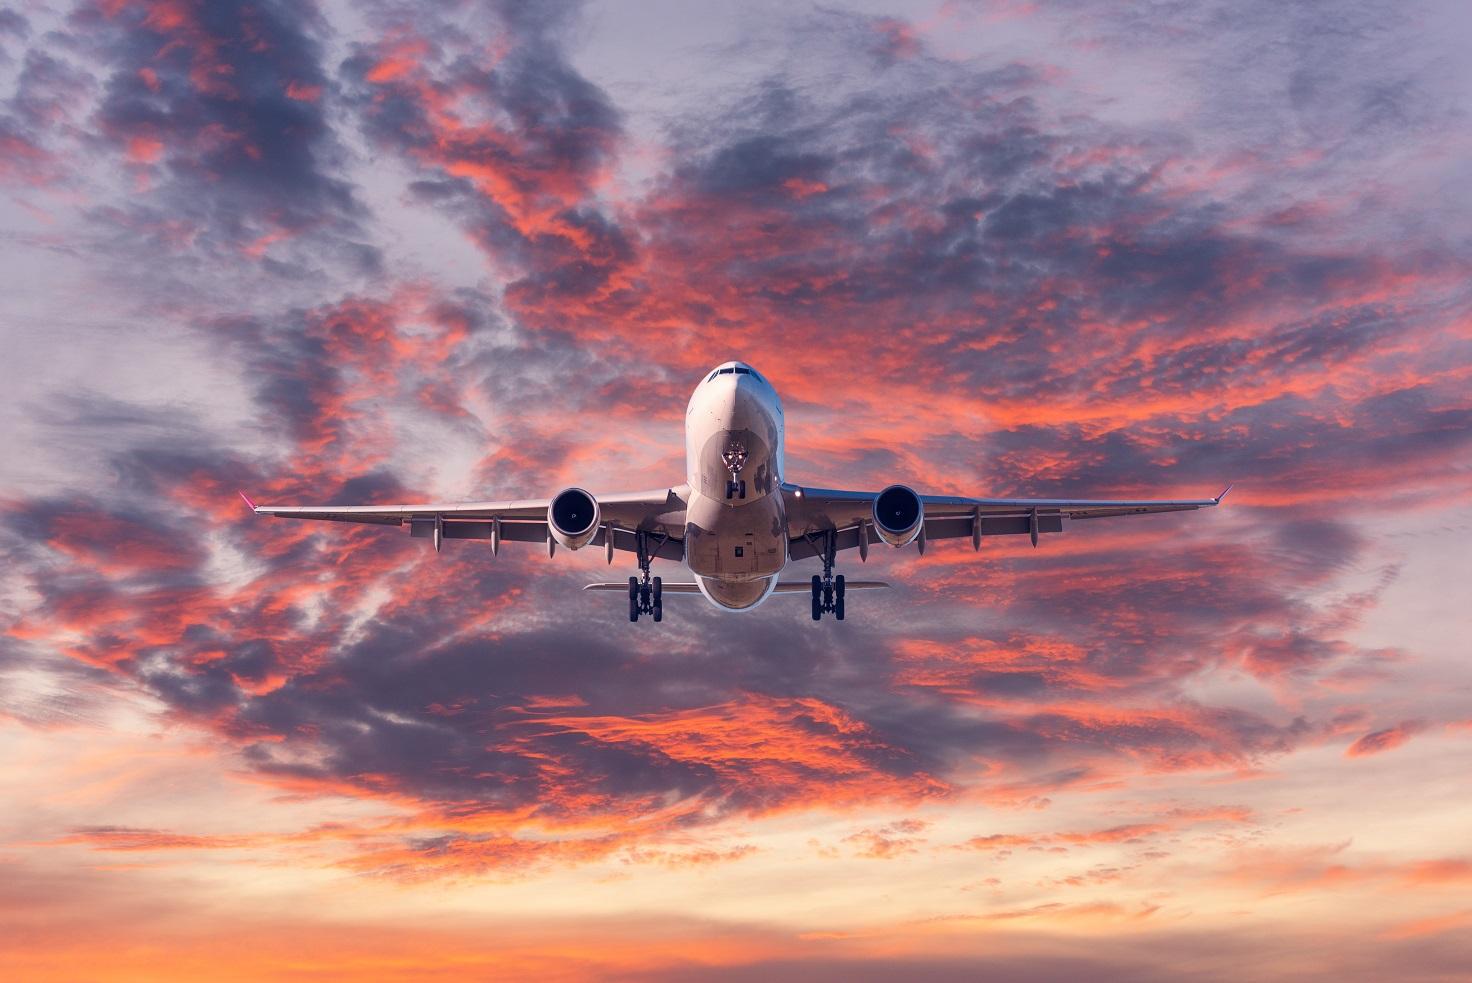 landing passenger airplane at colorful sunset MRSHV6Q #новости авиасообщение